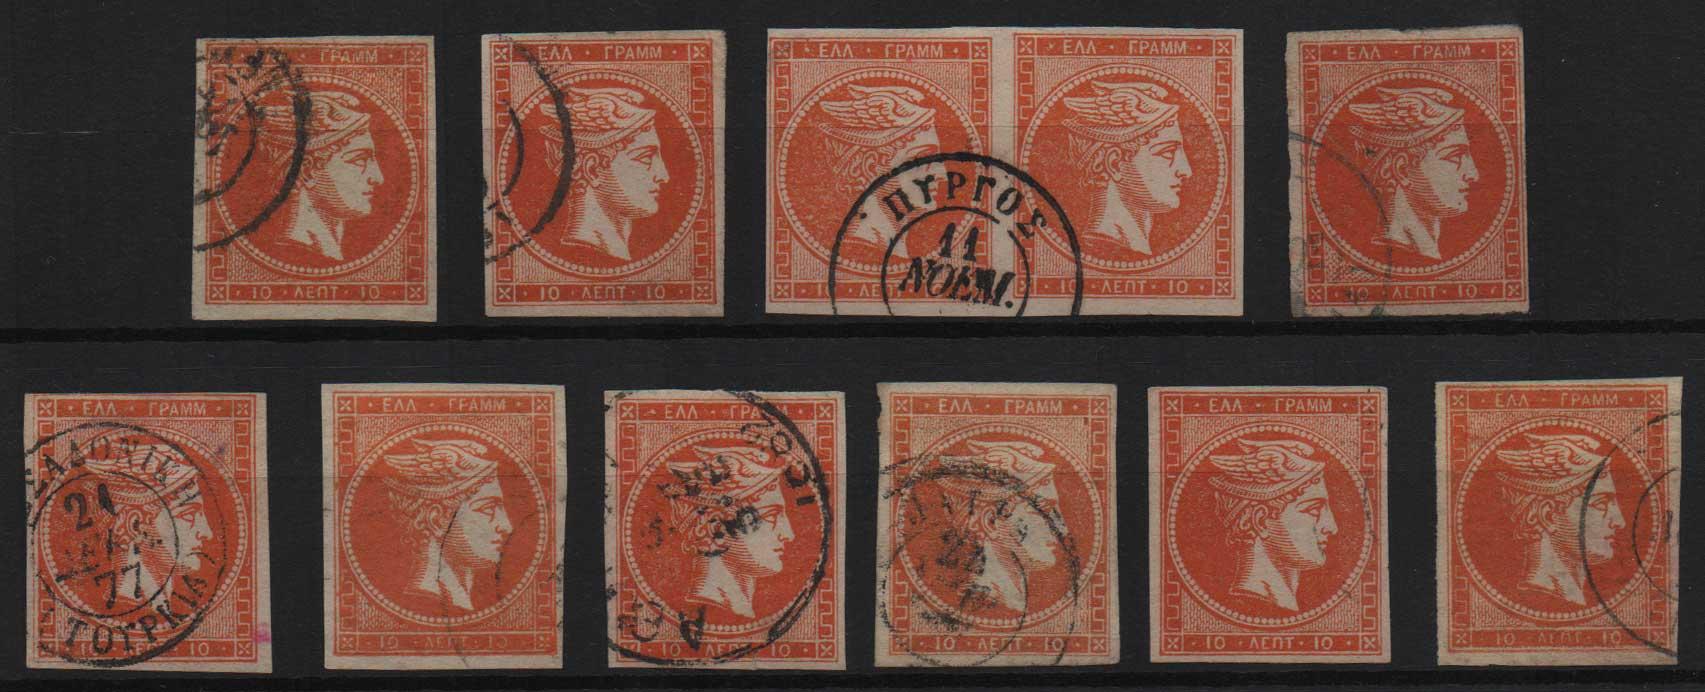 Lot 15 - -  LARGE HERMES HEAD large hermes head -  Athens Auctions Public Auction 69 General Stamp Sale